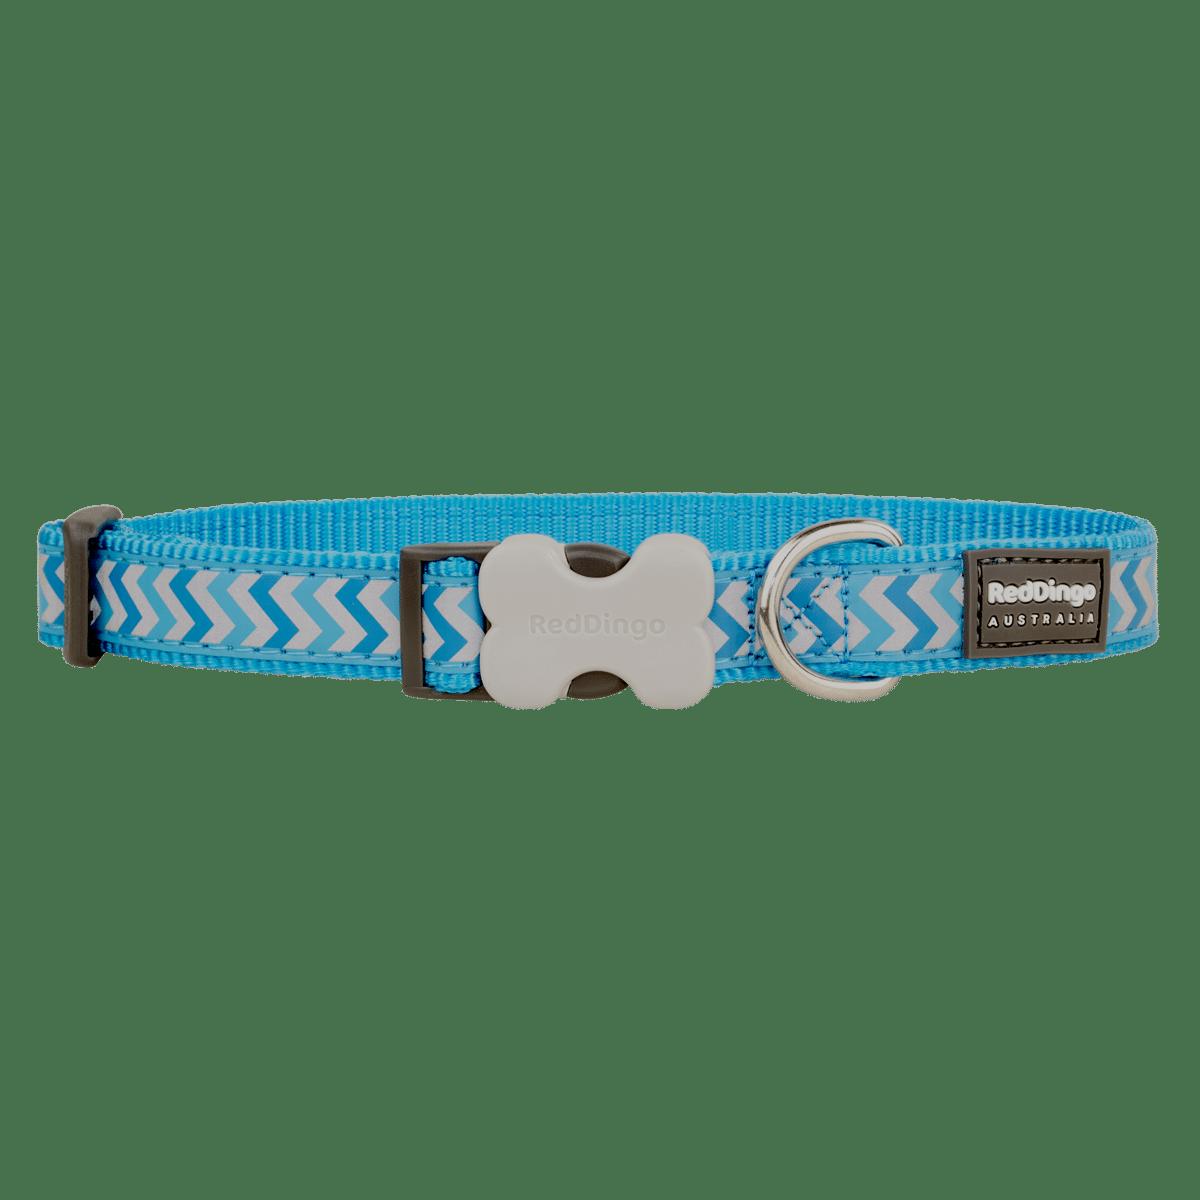 Hundhalsband av hög kvalitet med inbyggd reflex